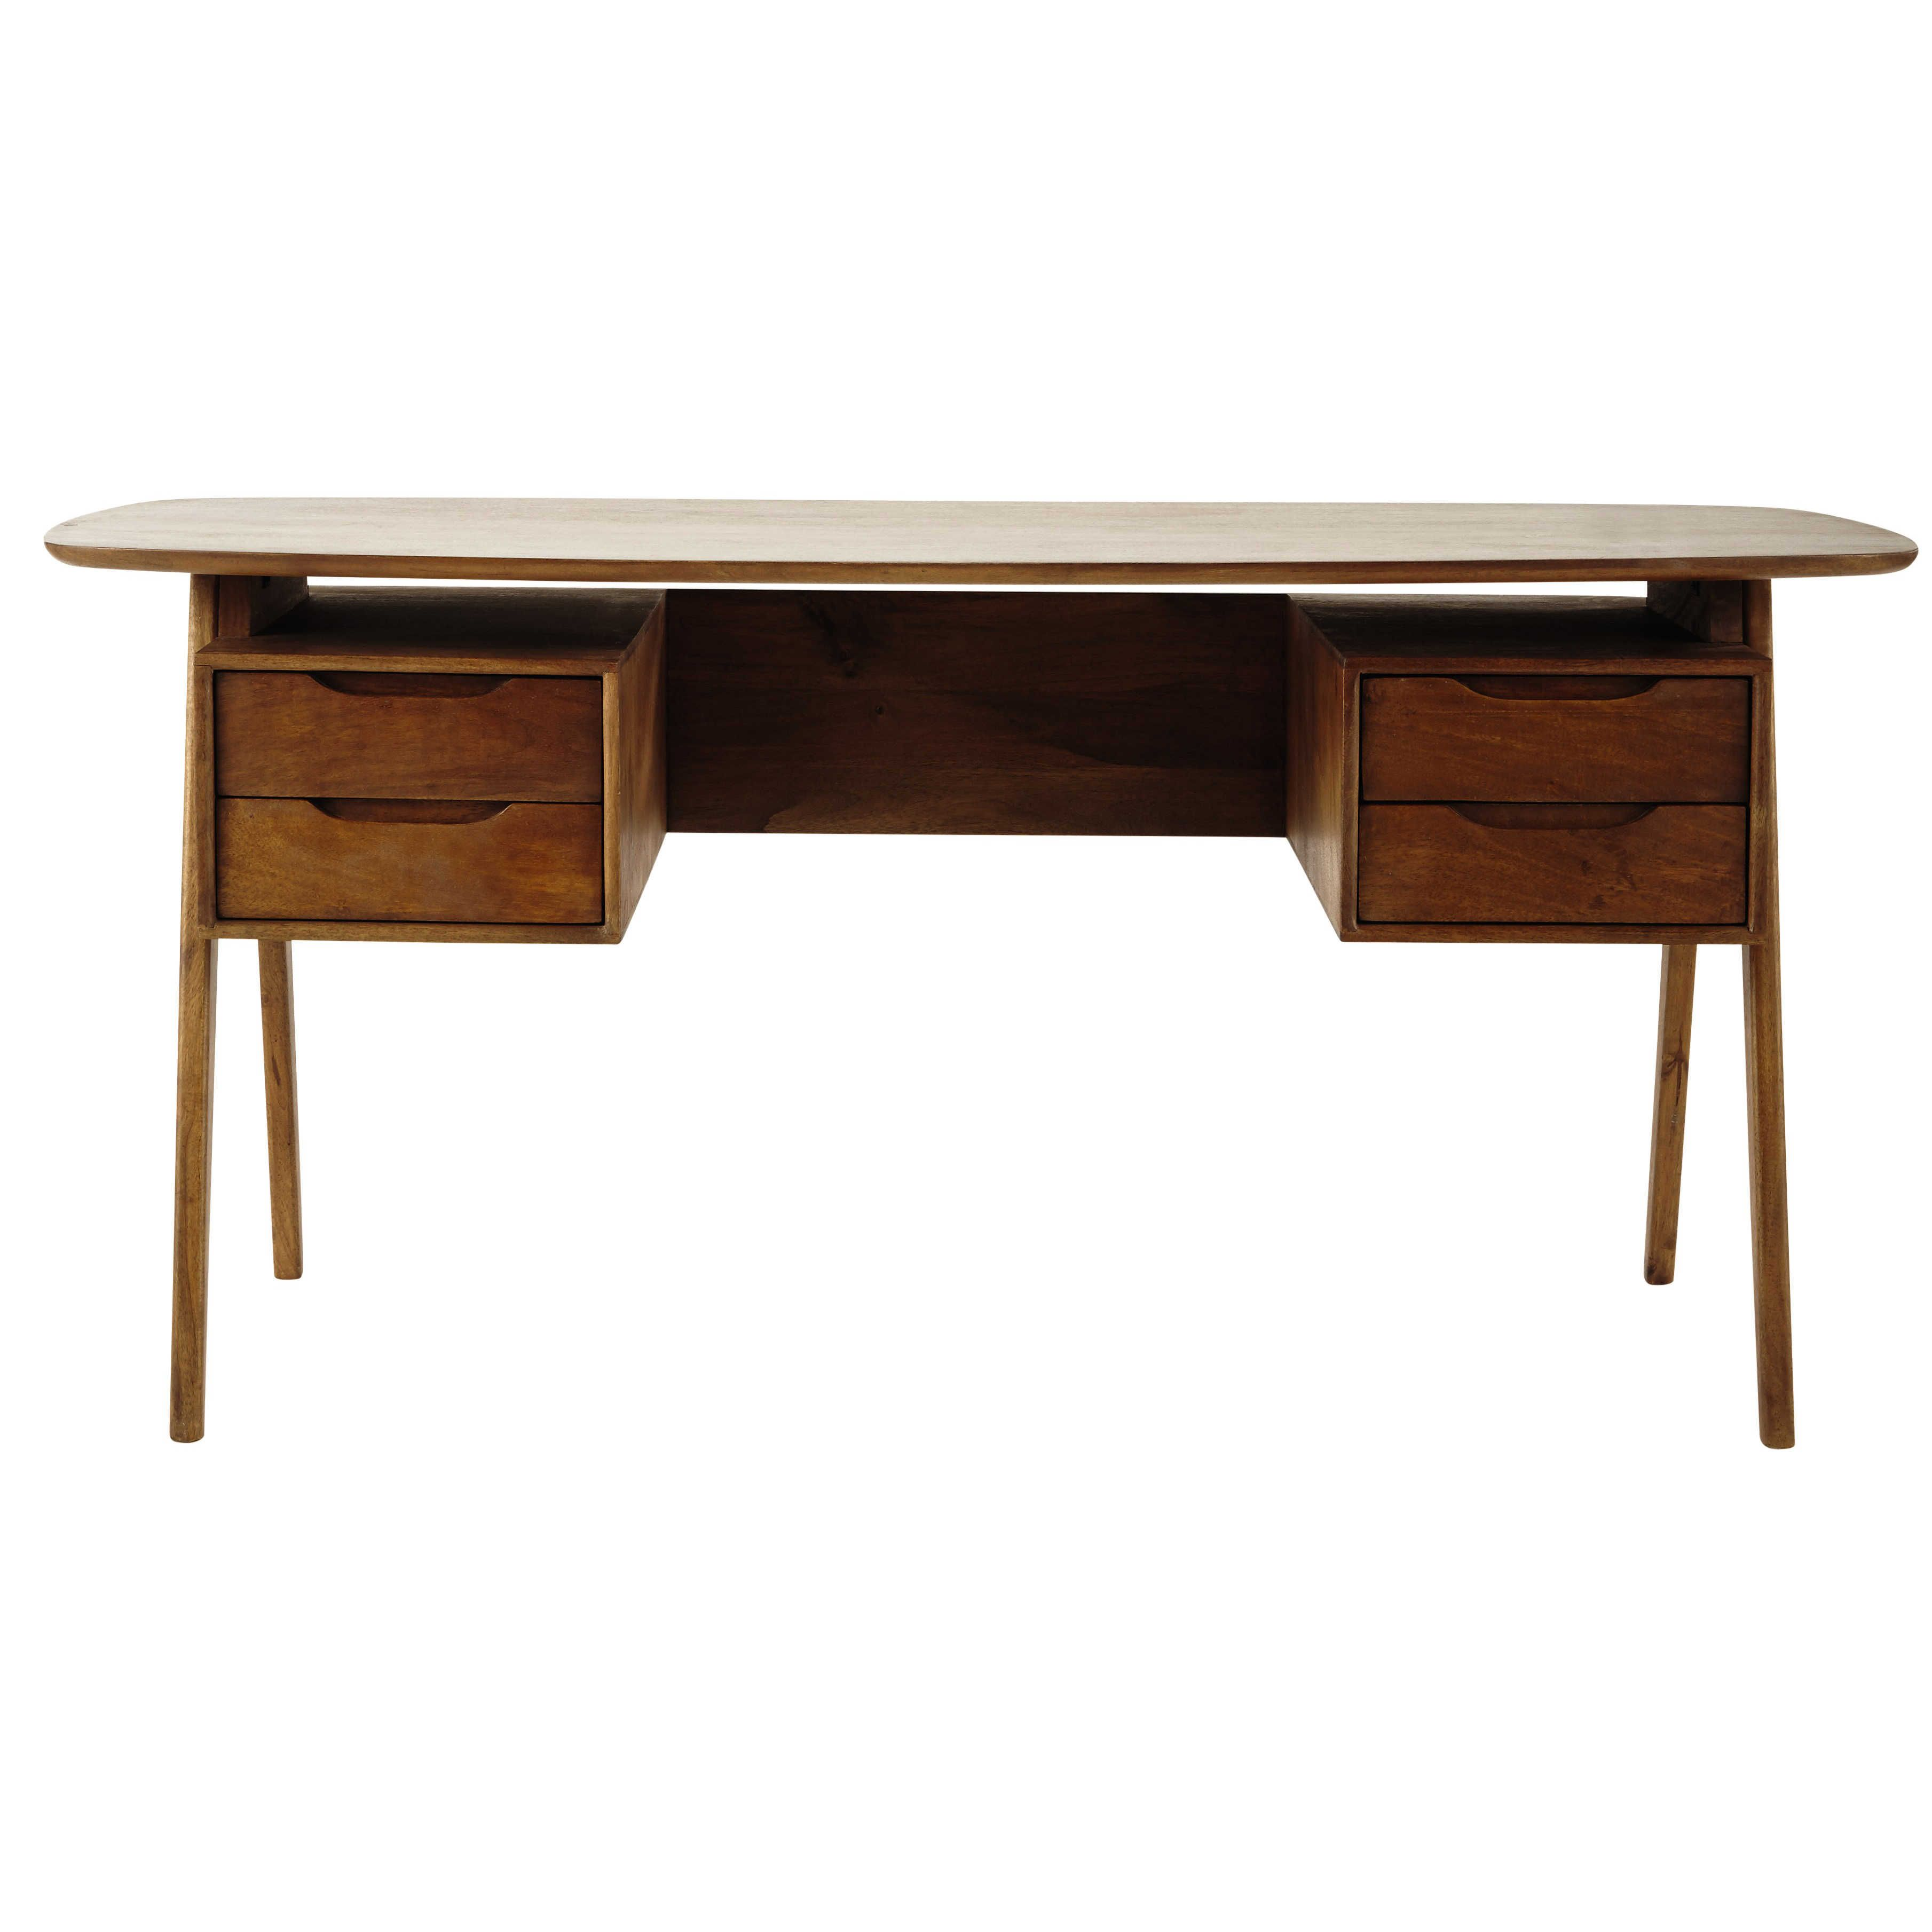 Mango wood vintage desk W 165cm Janeiro